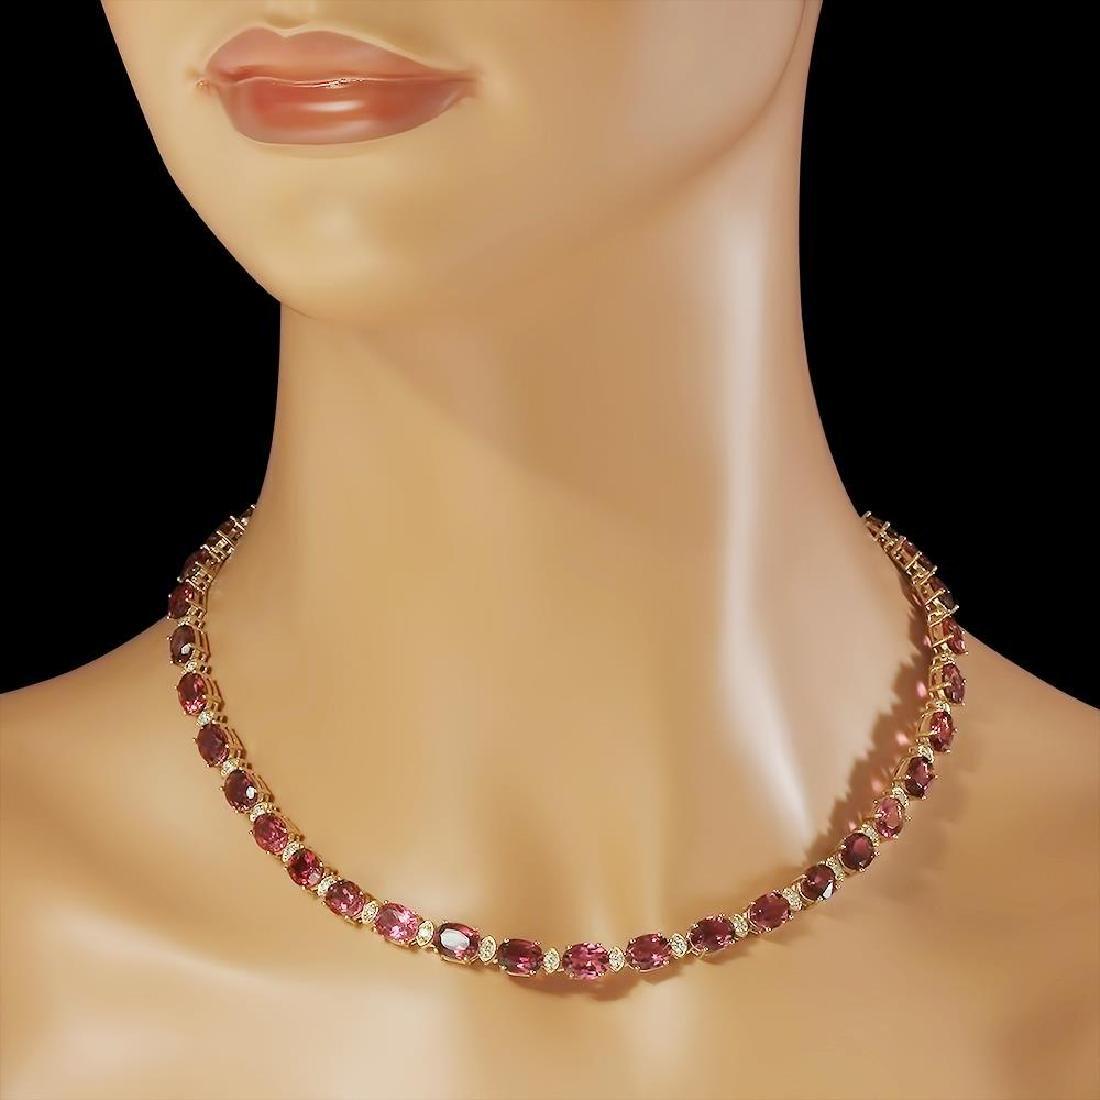 14K Gold 44.66ct Tourmaline 1.93ct Diamond Necklace - 3